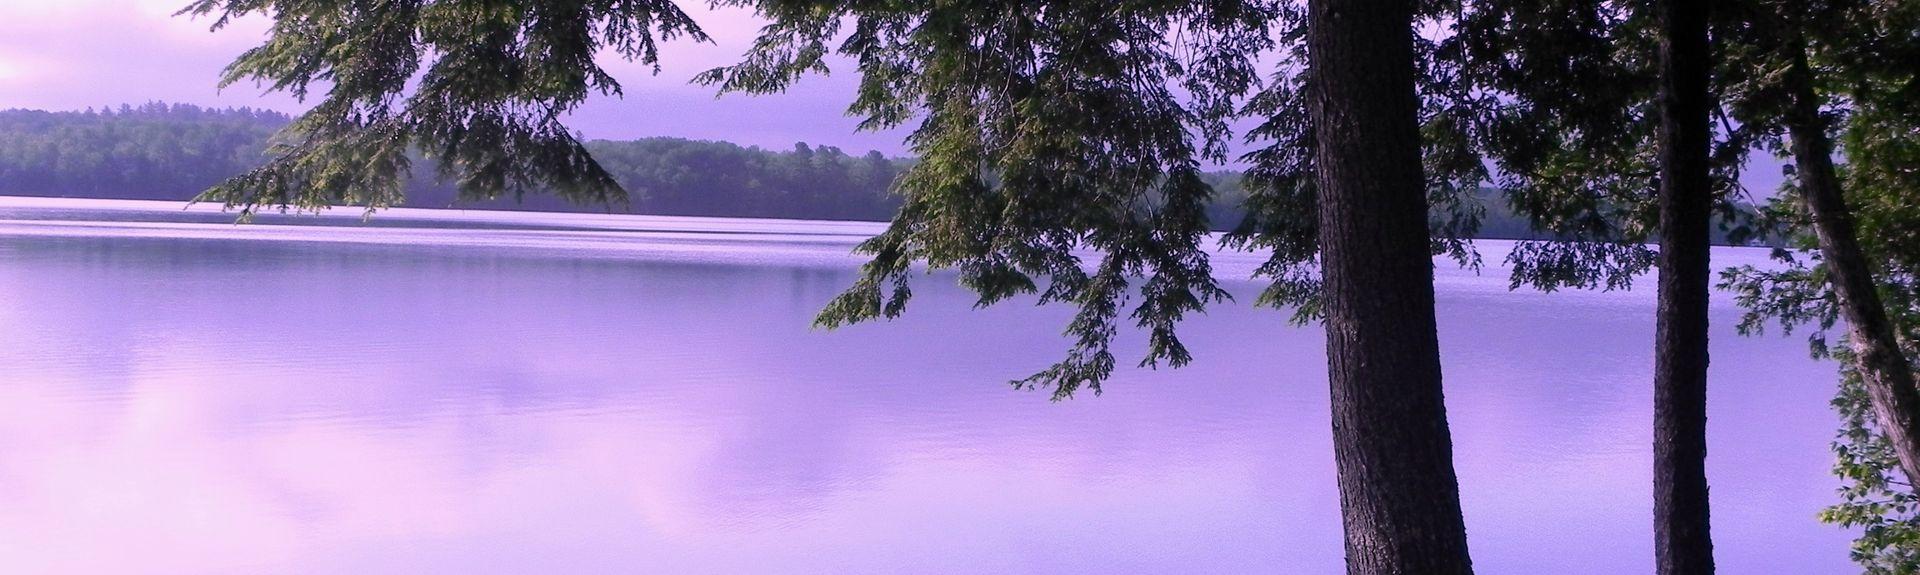 Dover-Foxcroft, Maine, United States